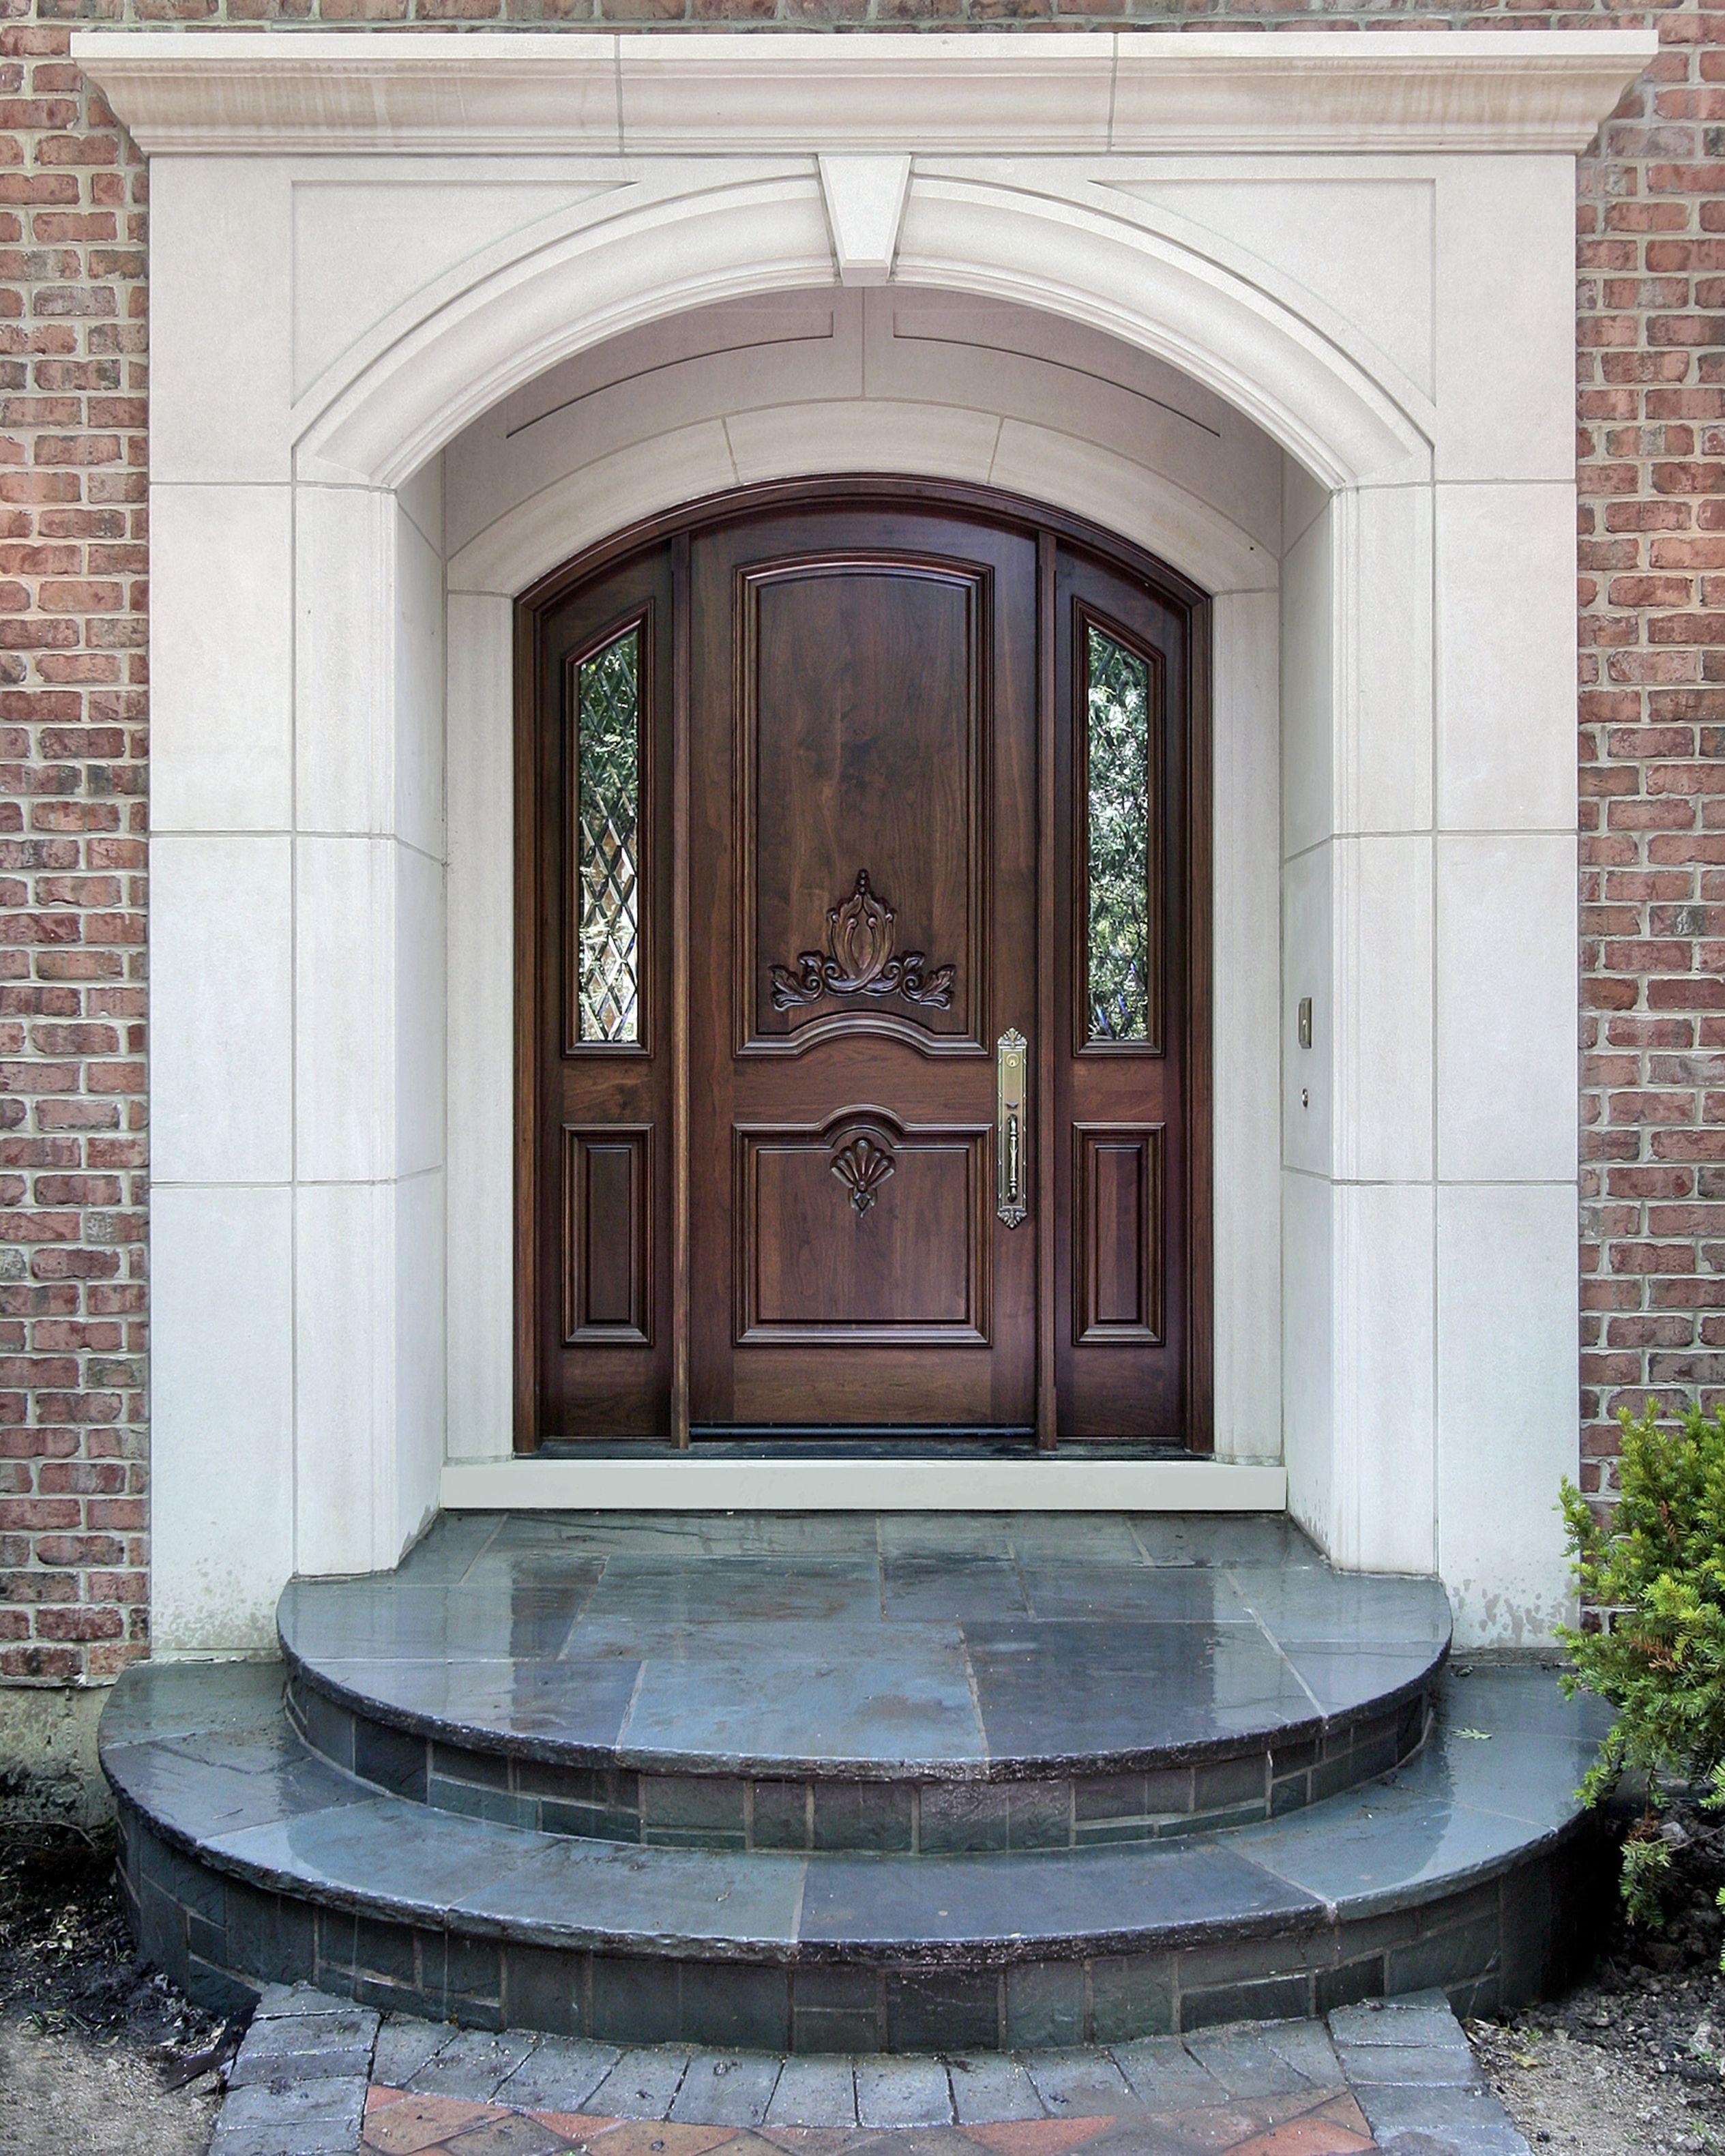 Cast Stone Door Surround Precast Door Surrounds Gfrc Cornices Keystone Entrance Design House Entrance Doors Main Door Design Front Door Design